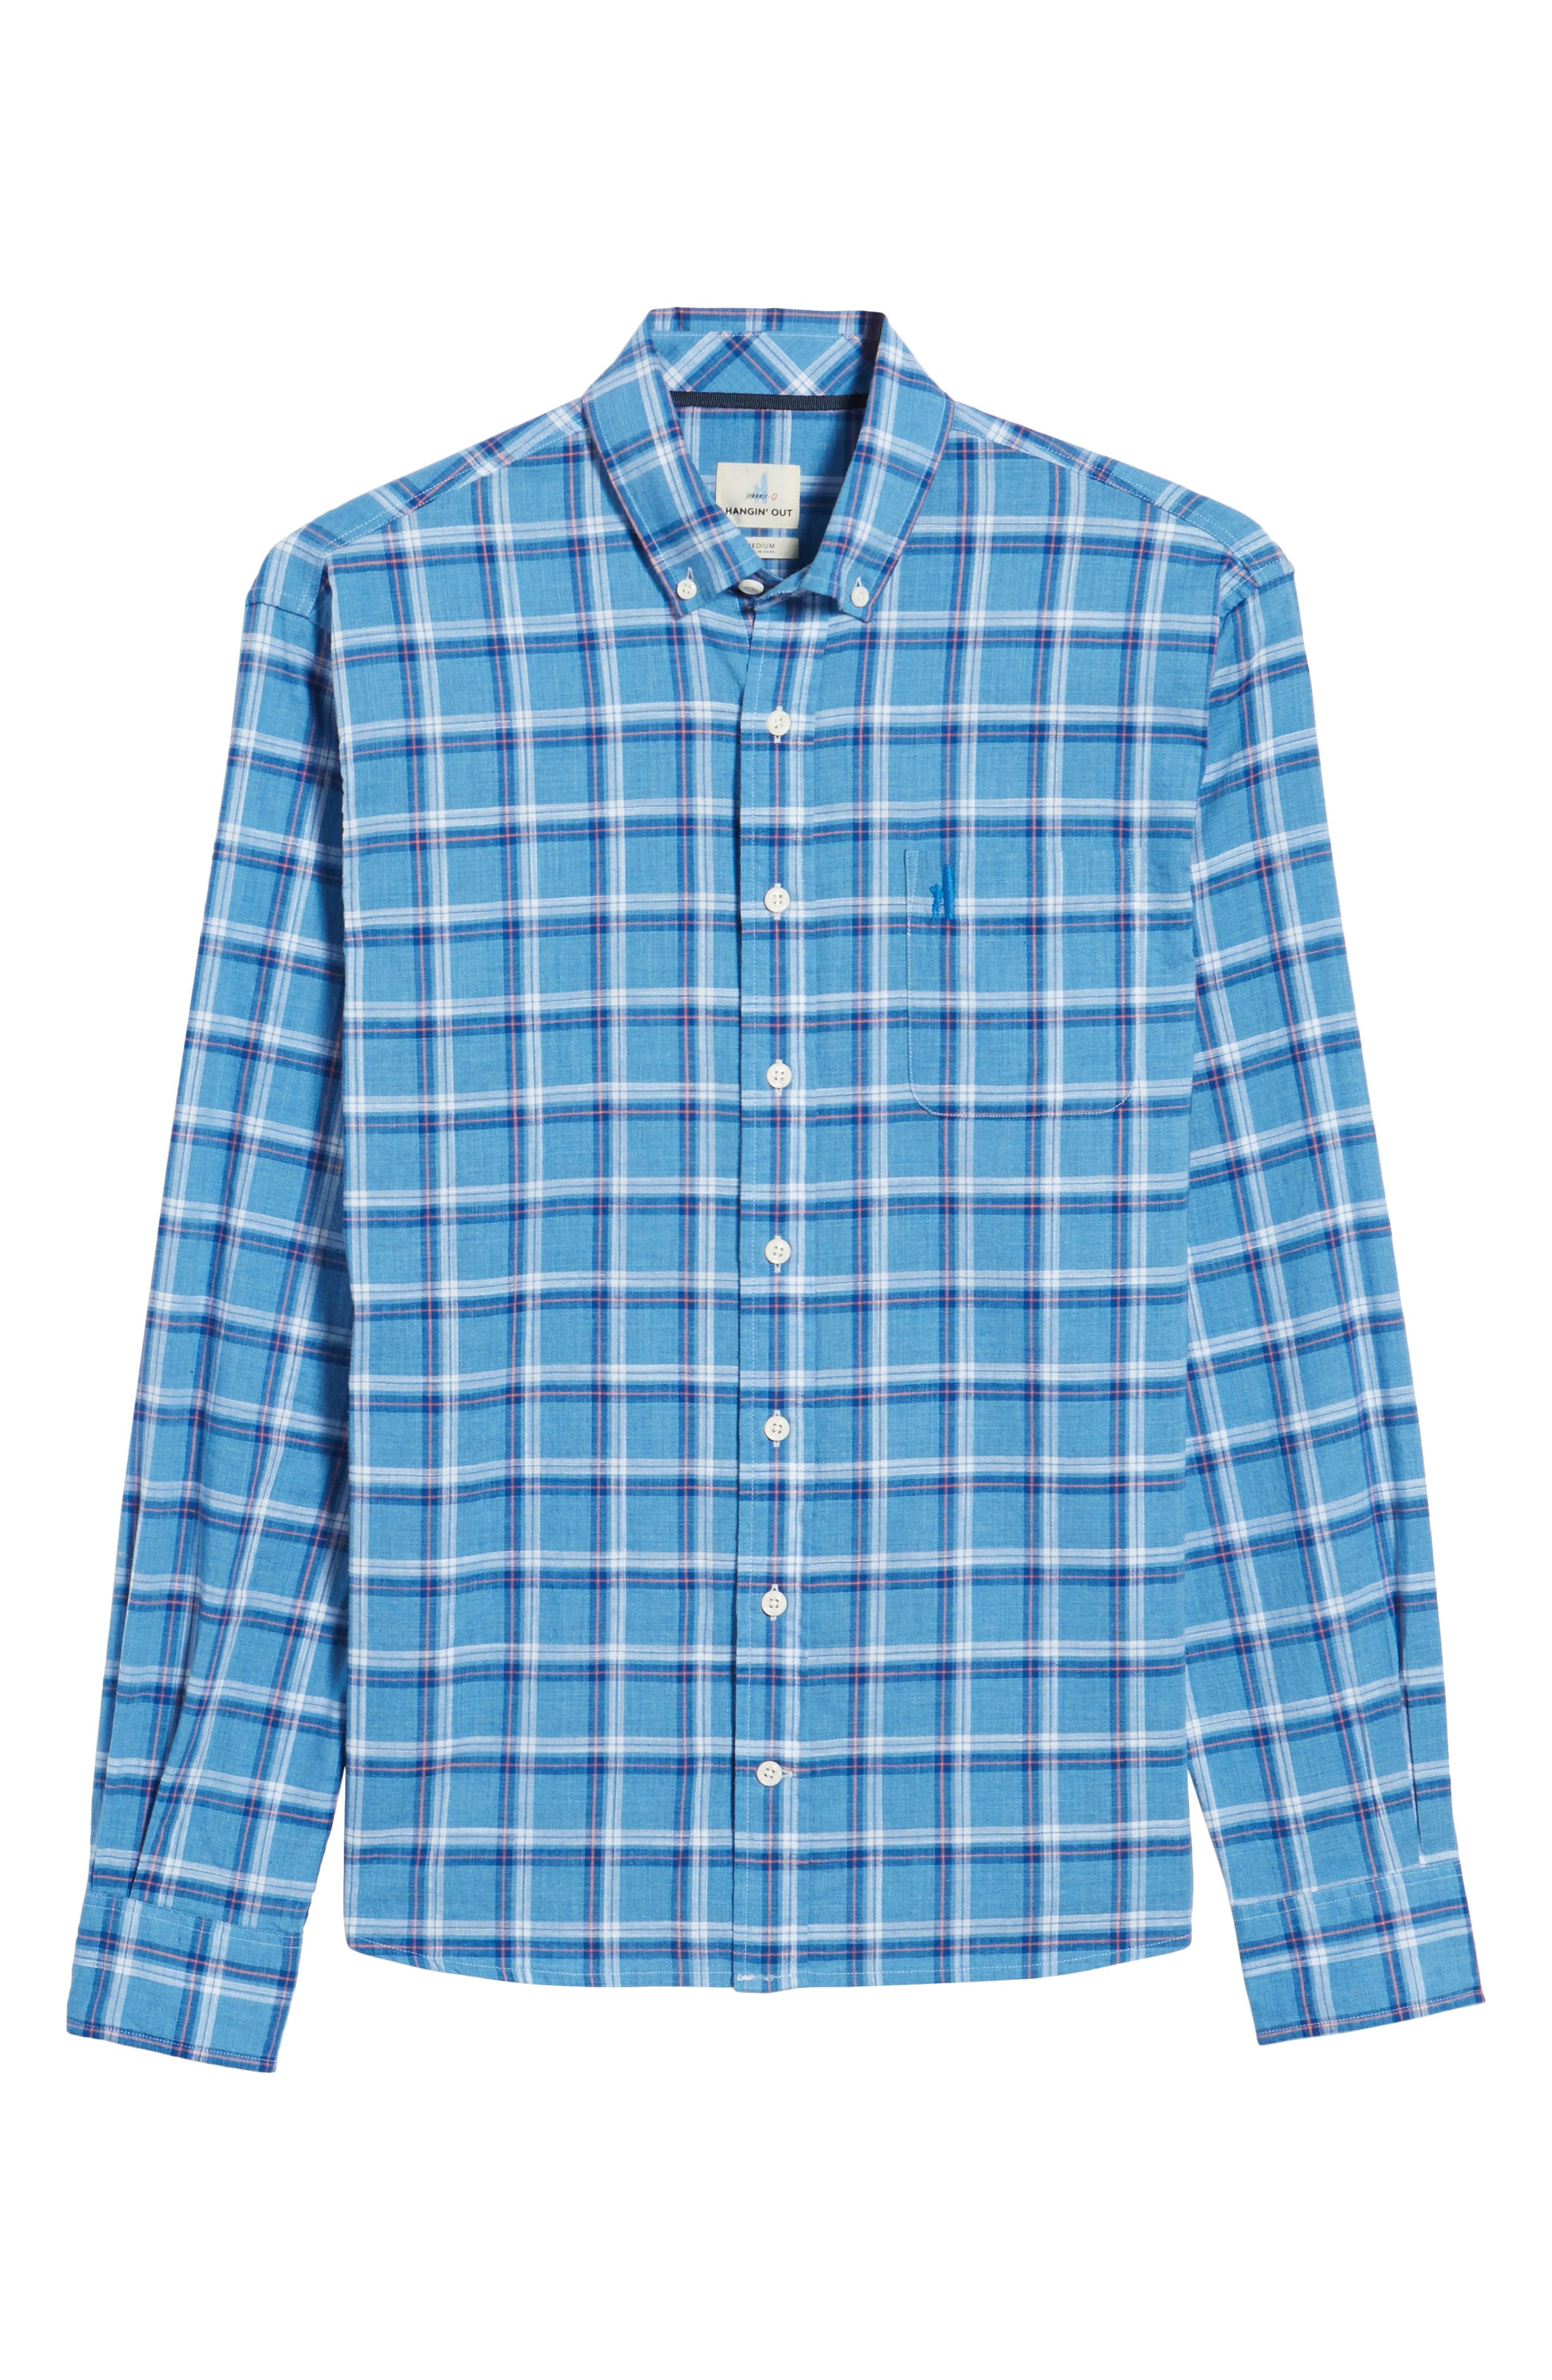 Davis Regular Fit Sport Shirt,                             Alternate thumbnail 6, color,                             200